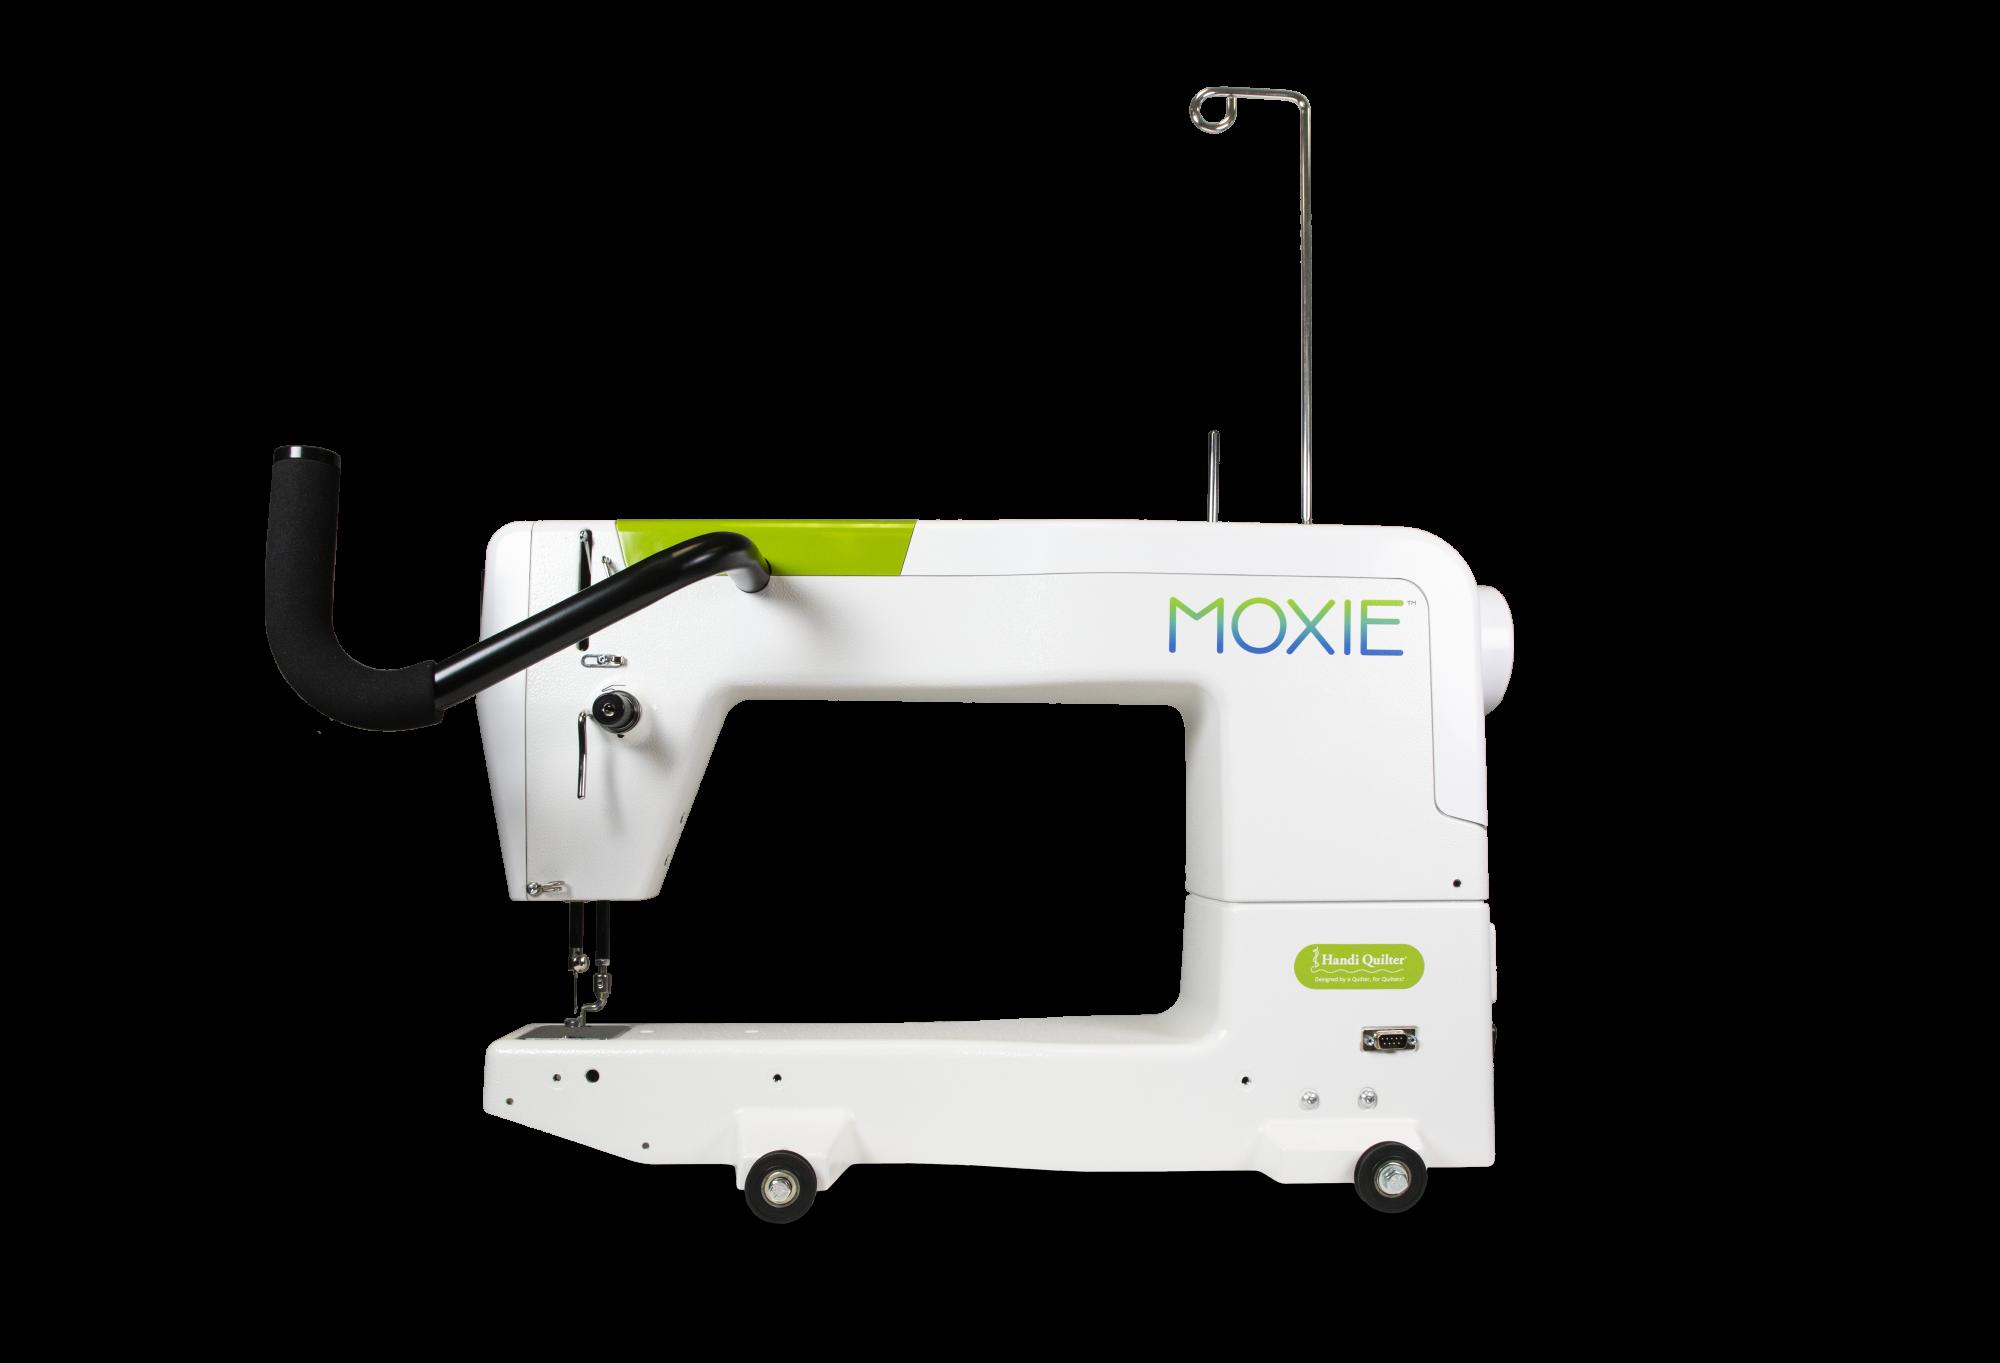 HQ Moxie with Loft Frame